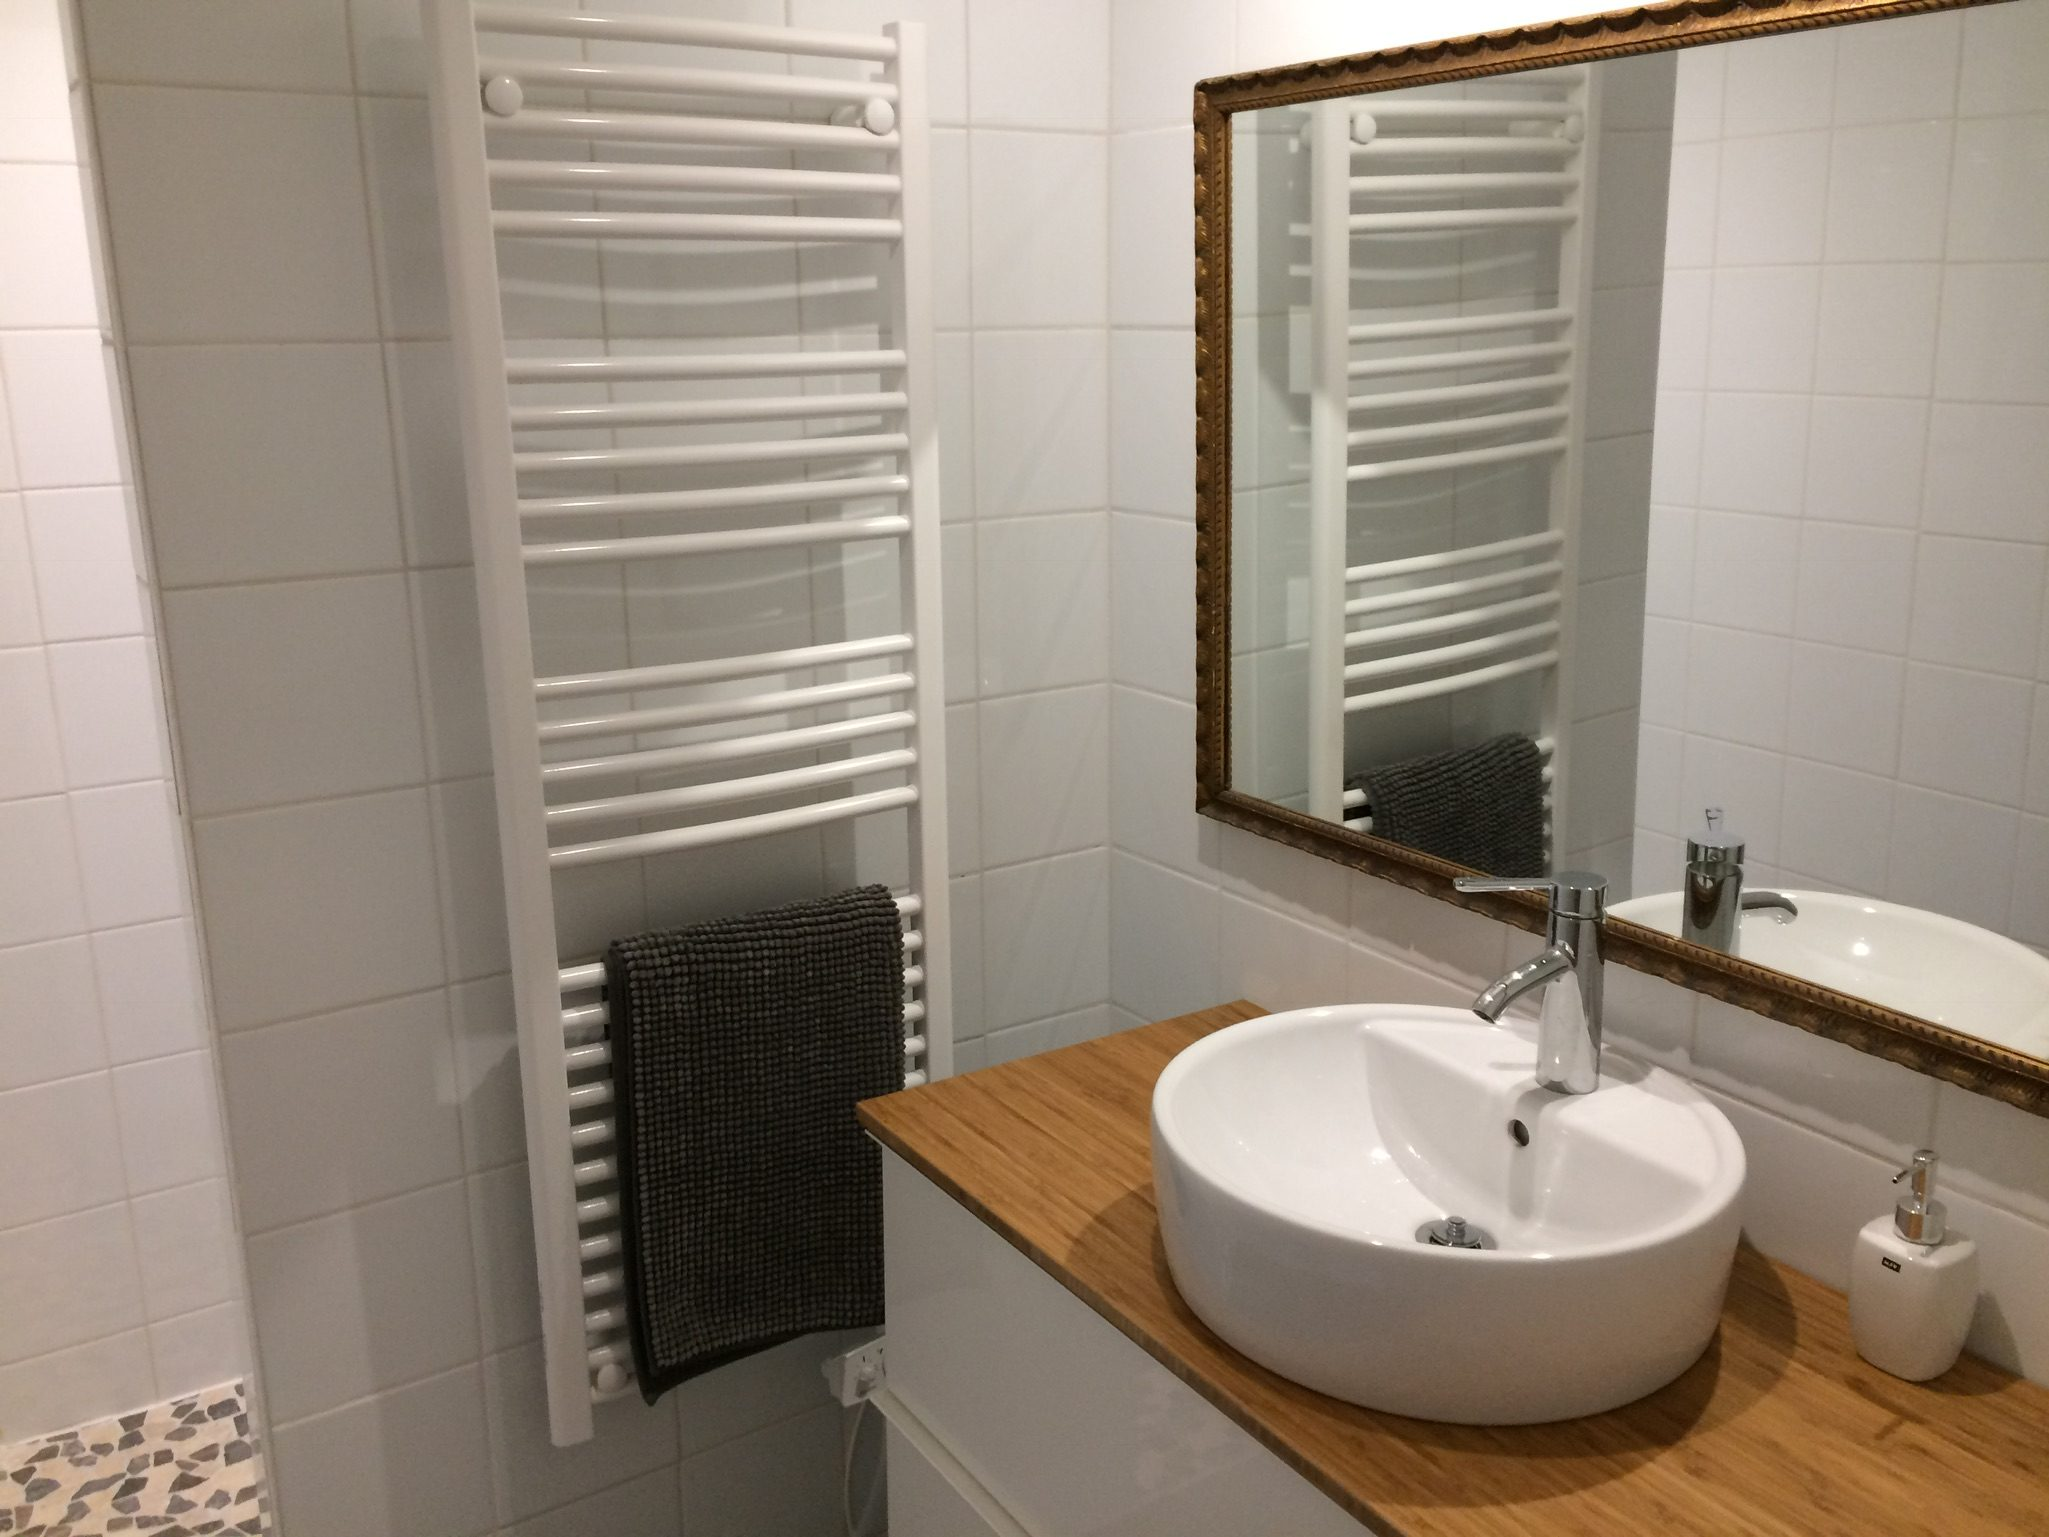 badkamer gîte vakantiehuisje Domaine du Merlet Zuid Frankrijk